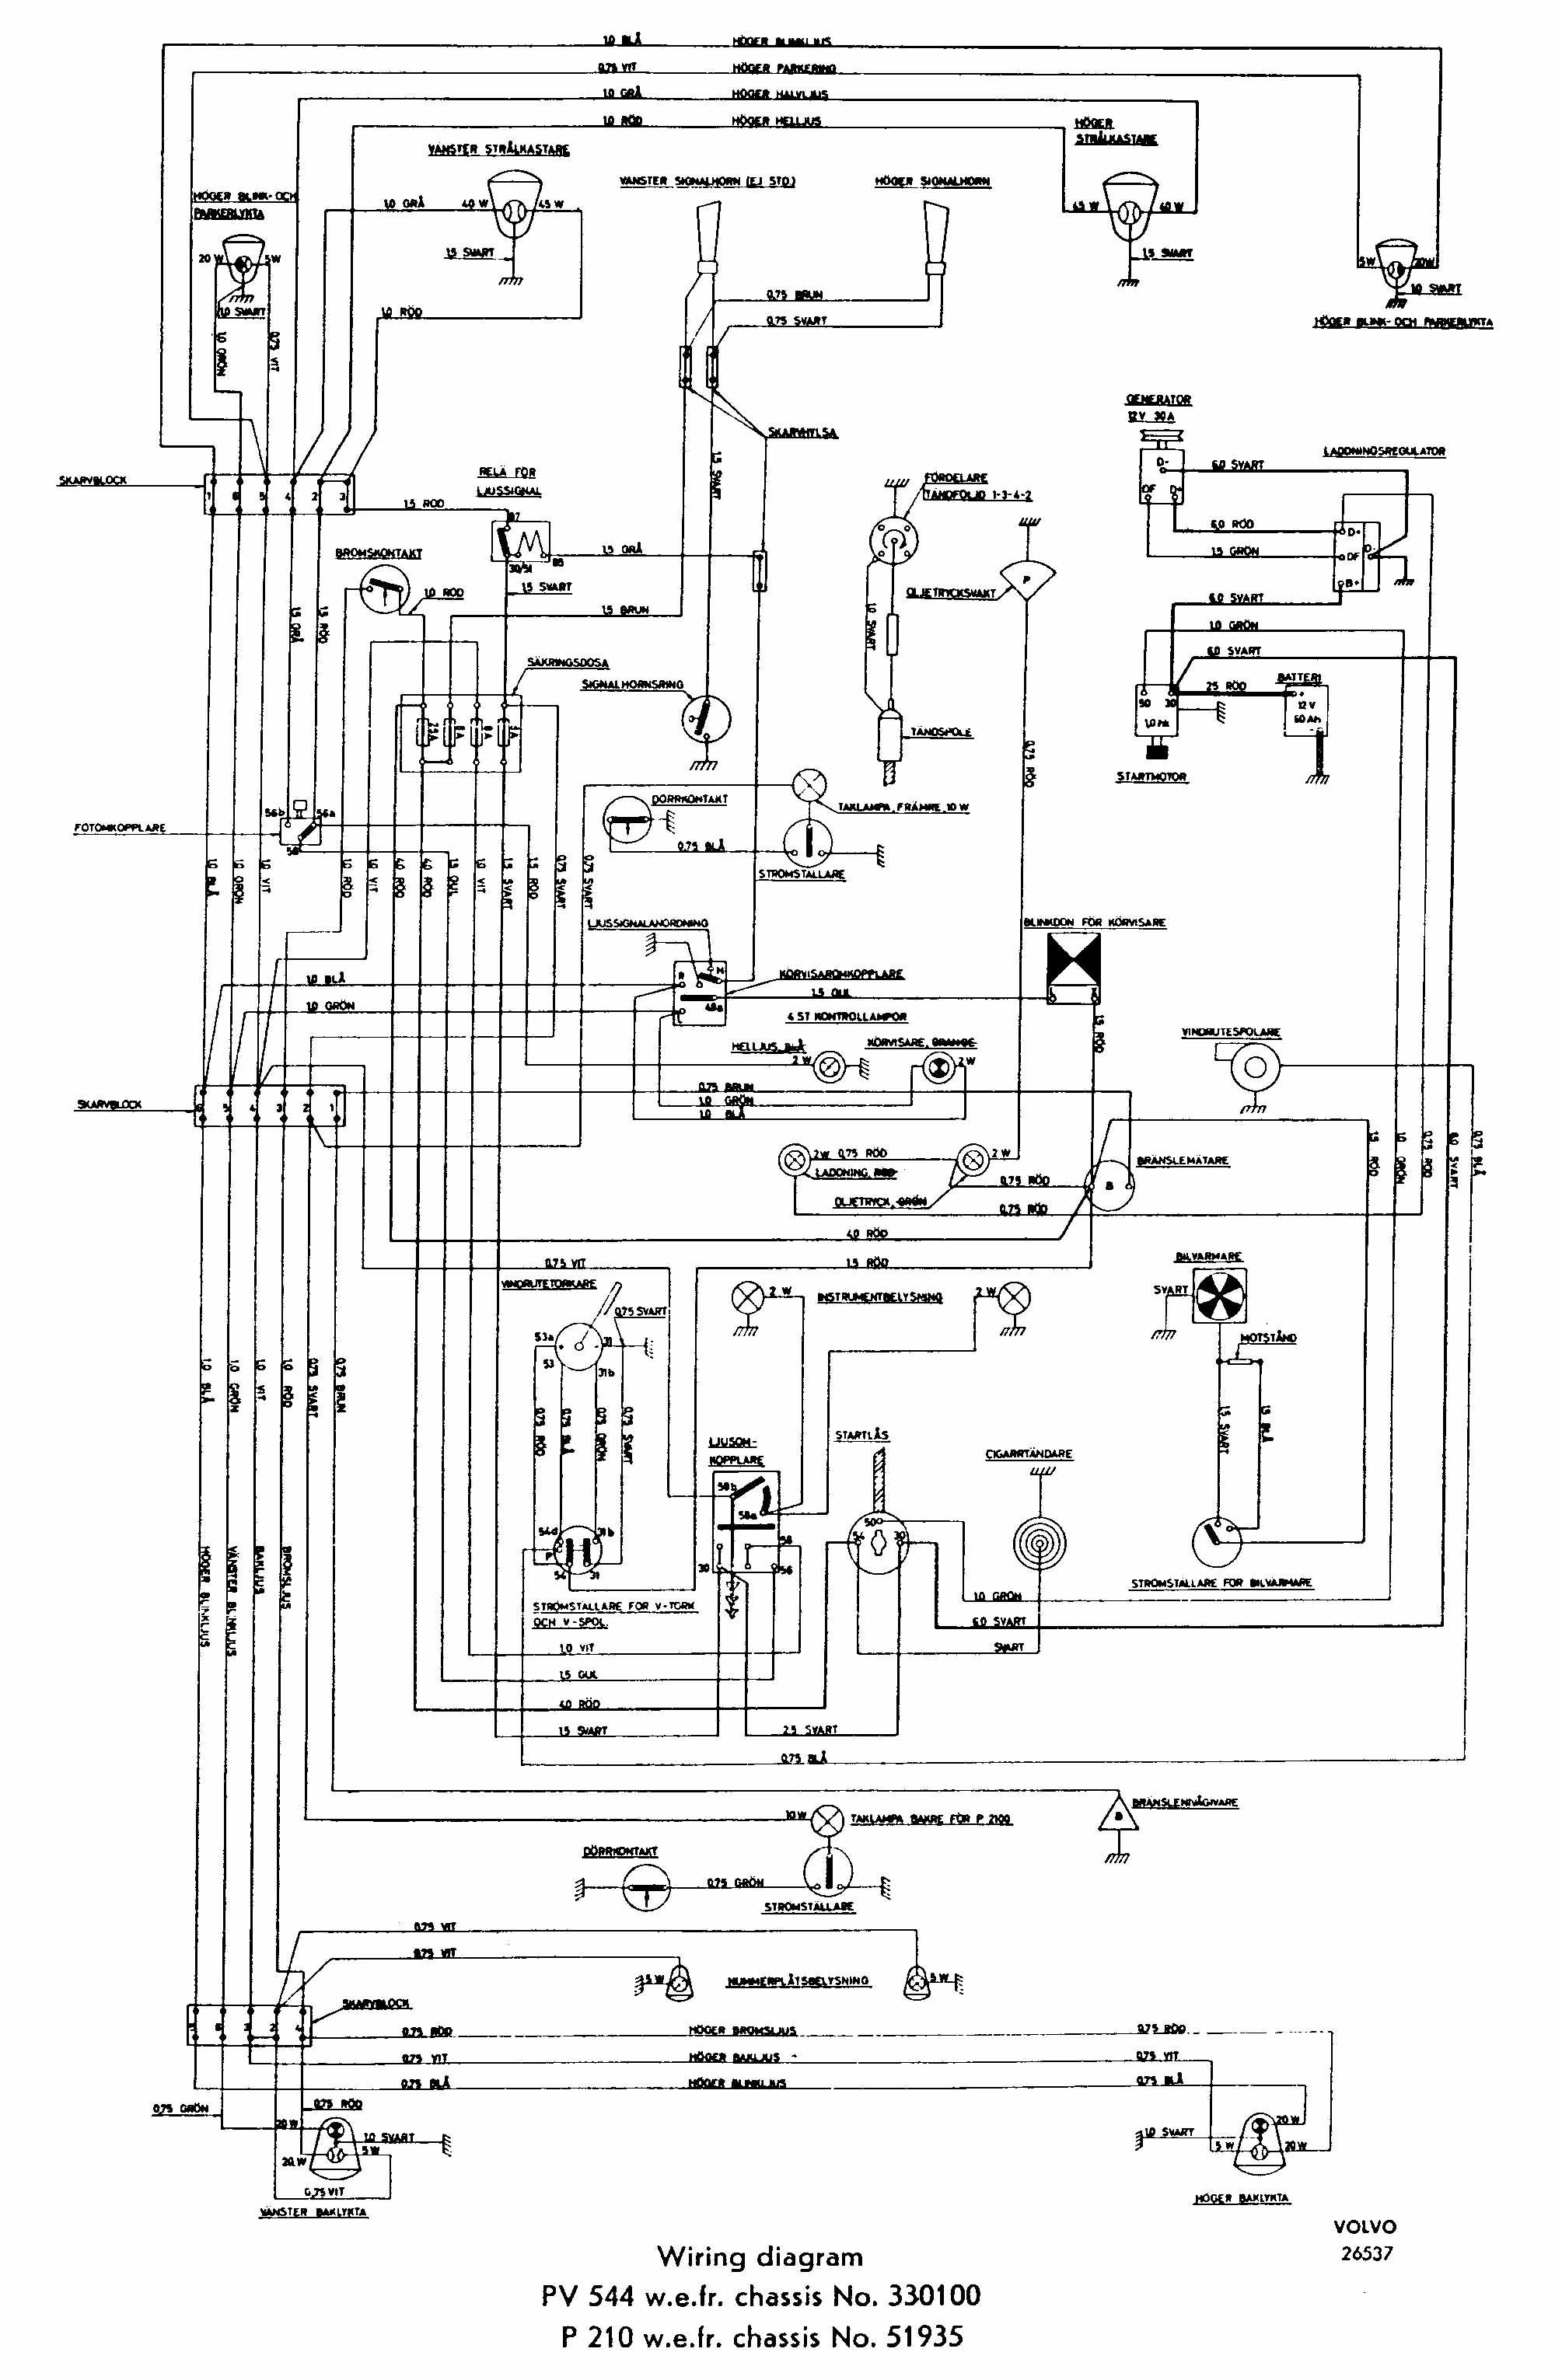 emergency lighting wiring diagram wiring diagram